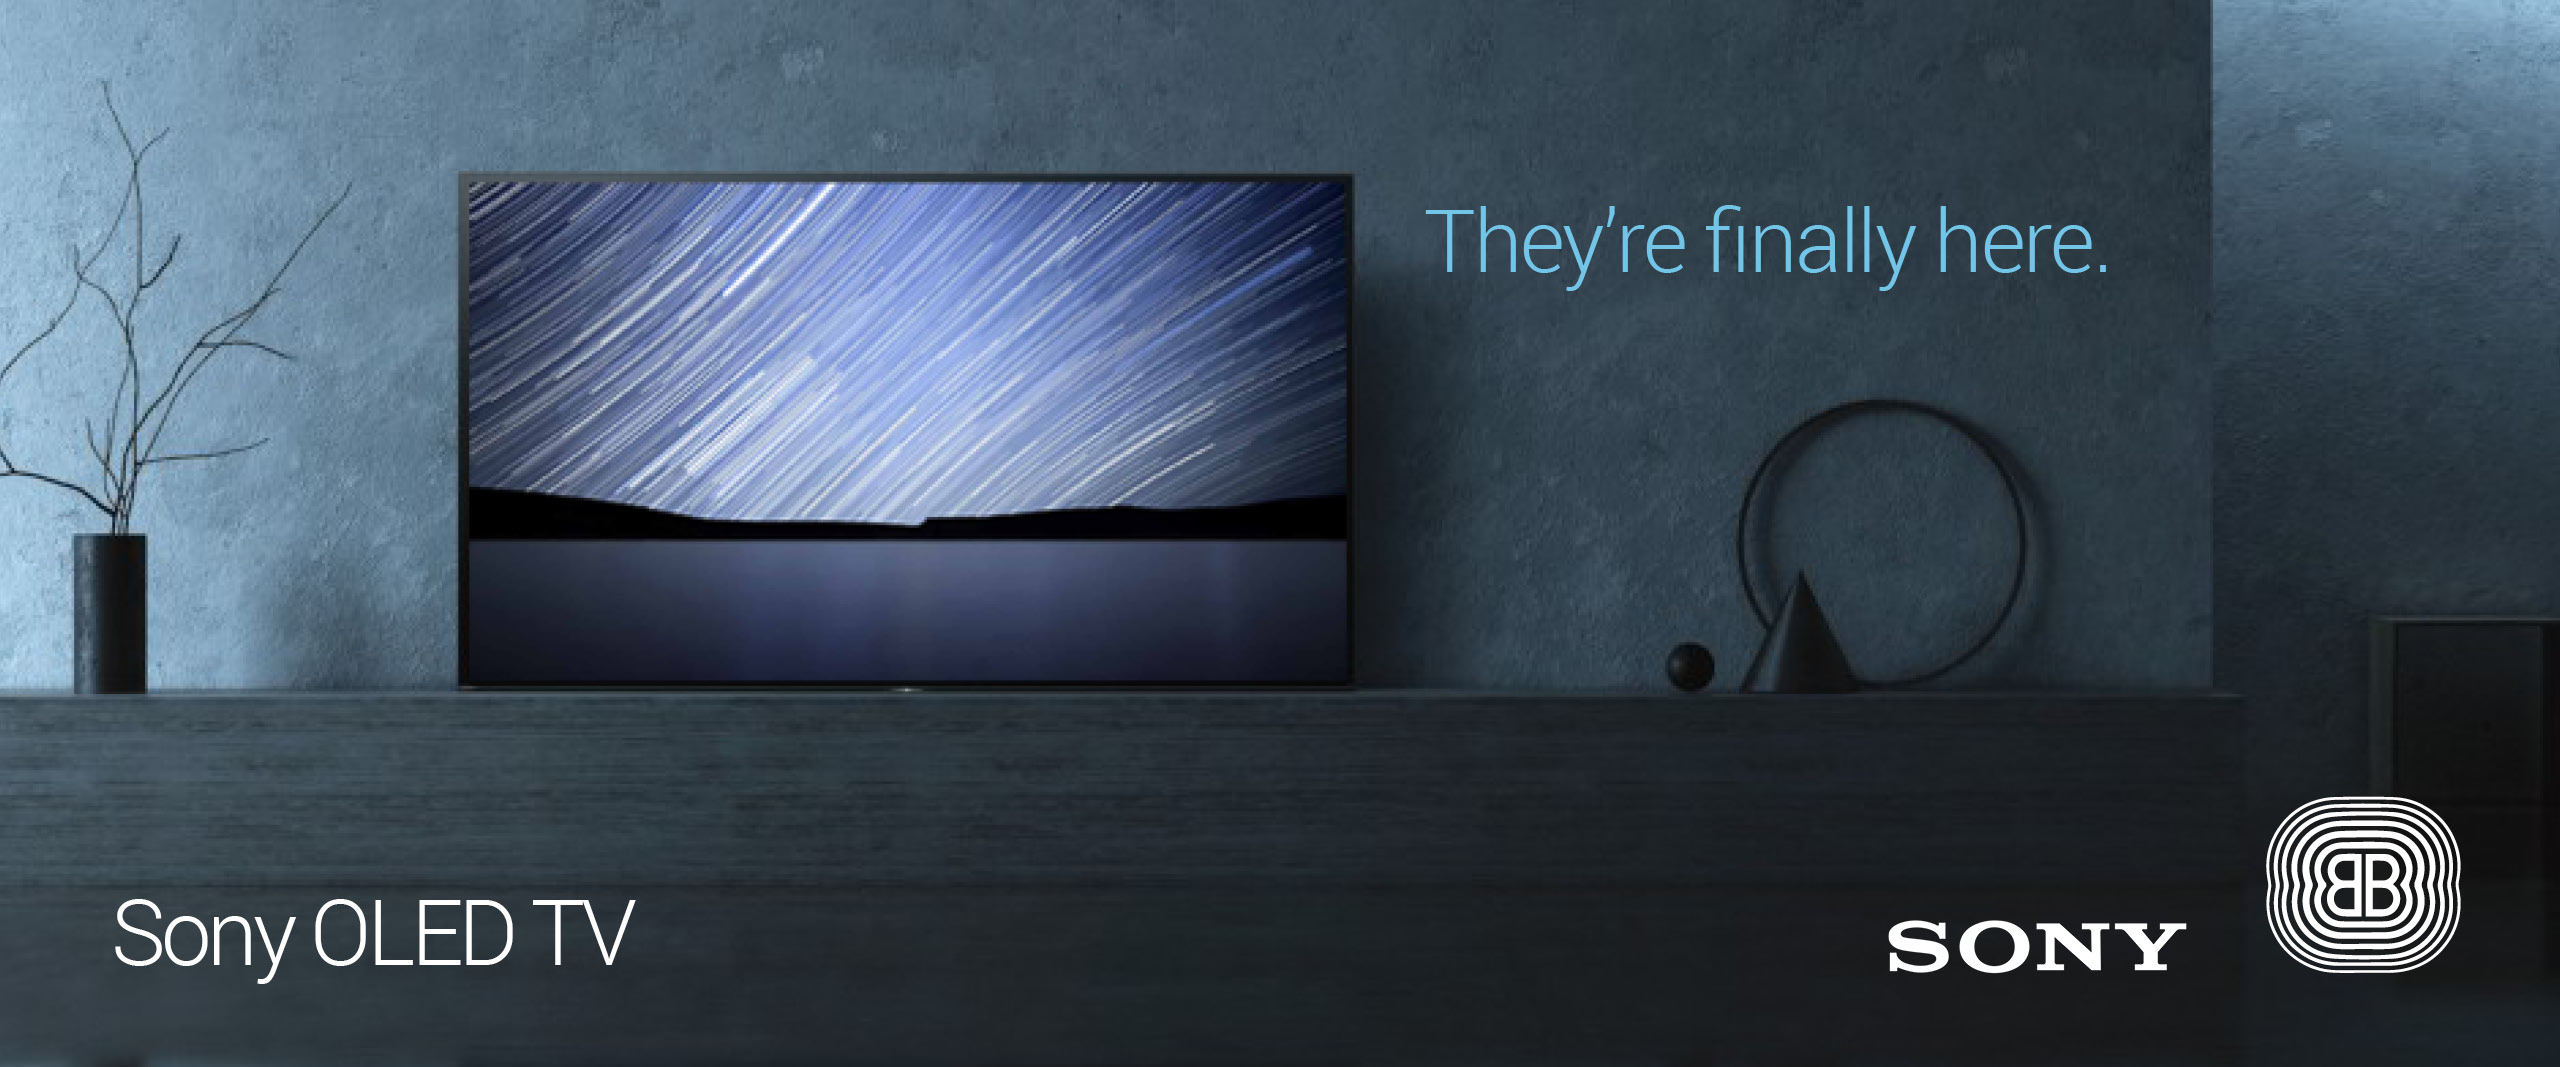 Sony OLED